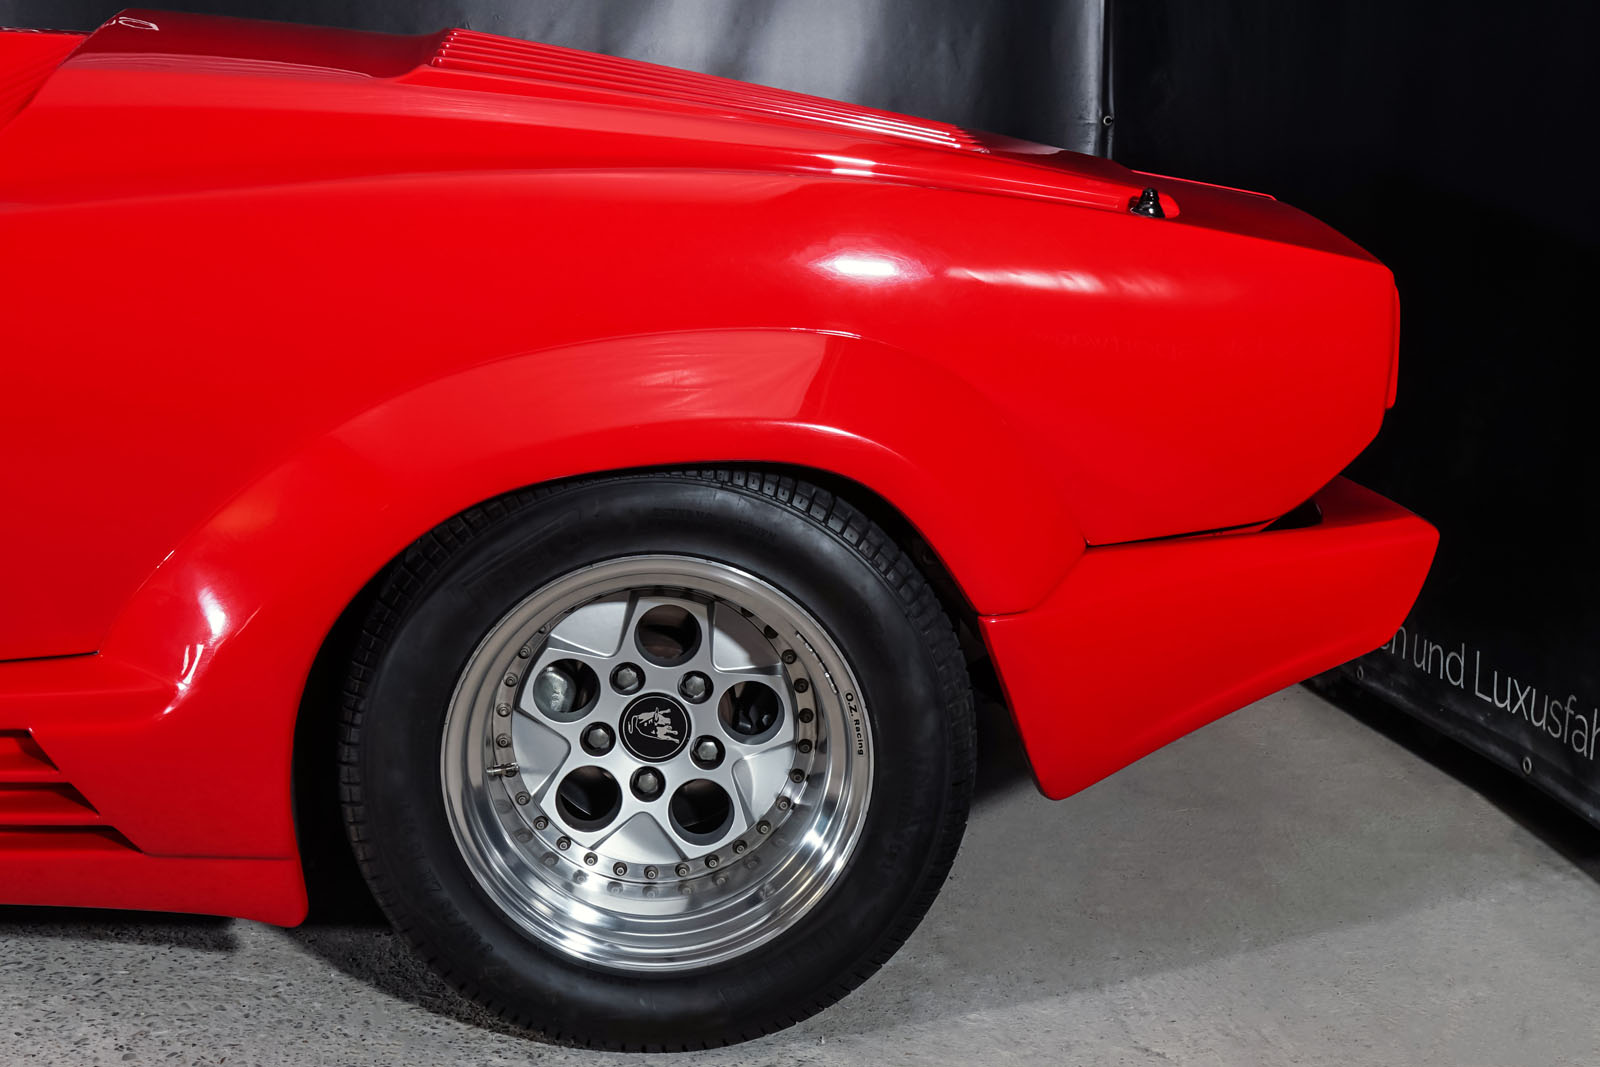 Lamborghini_Countach_Rot_Schwarz_LAM-2811_6_w